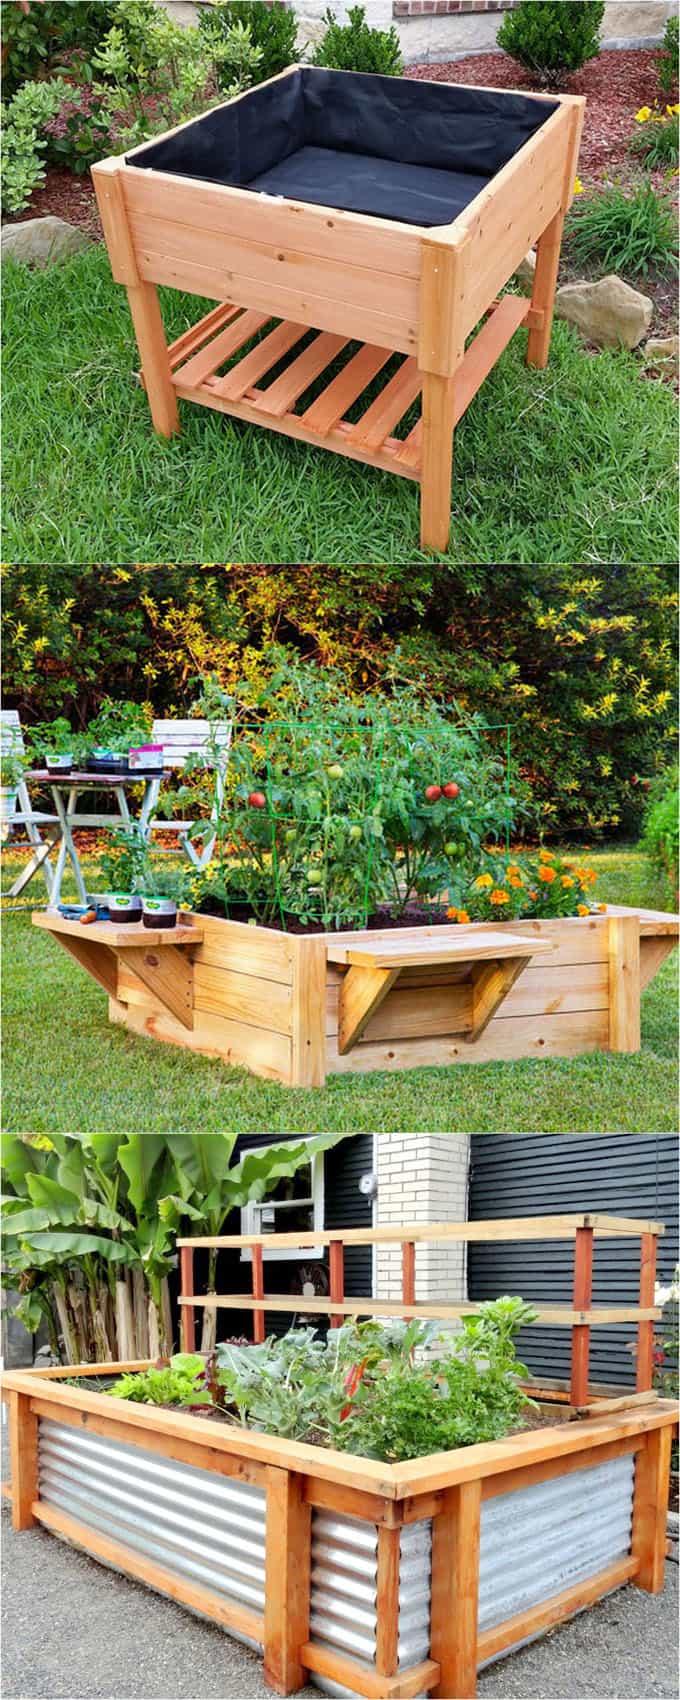 Raised Bed Vegetable Garden Designs